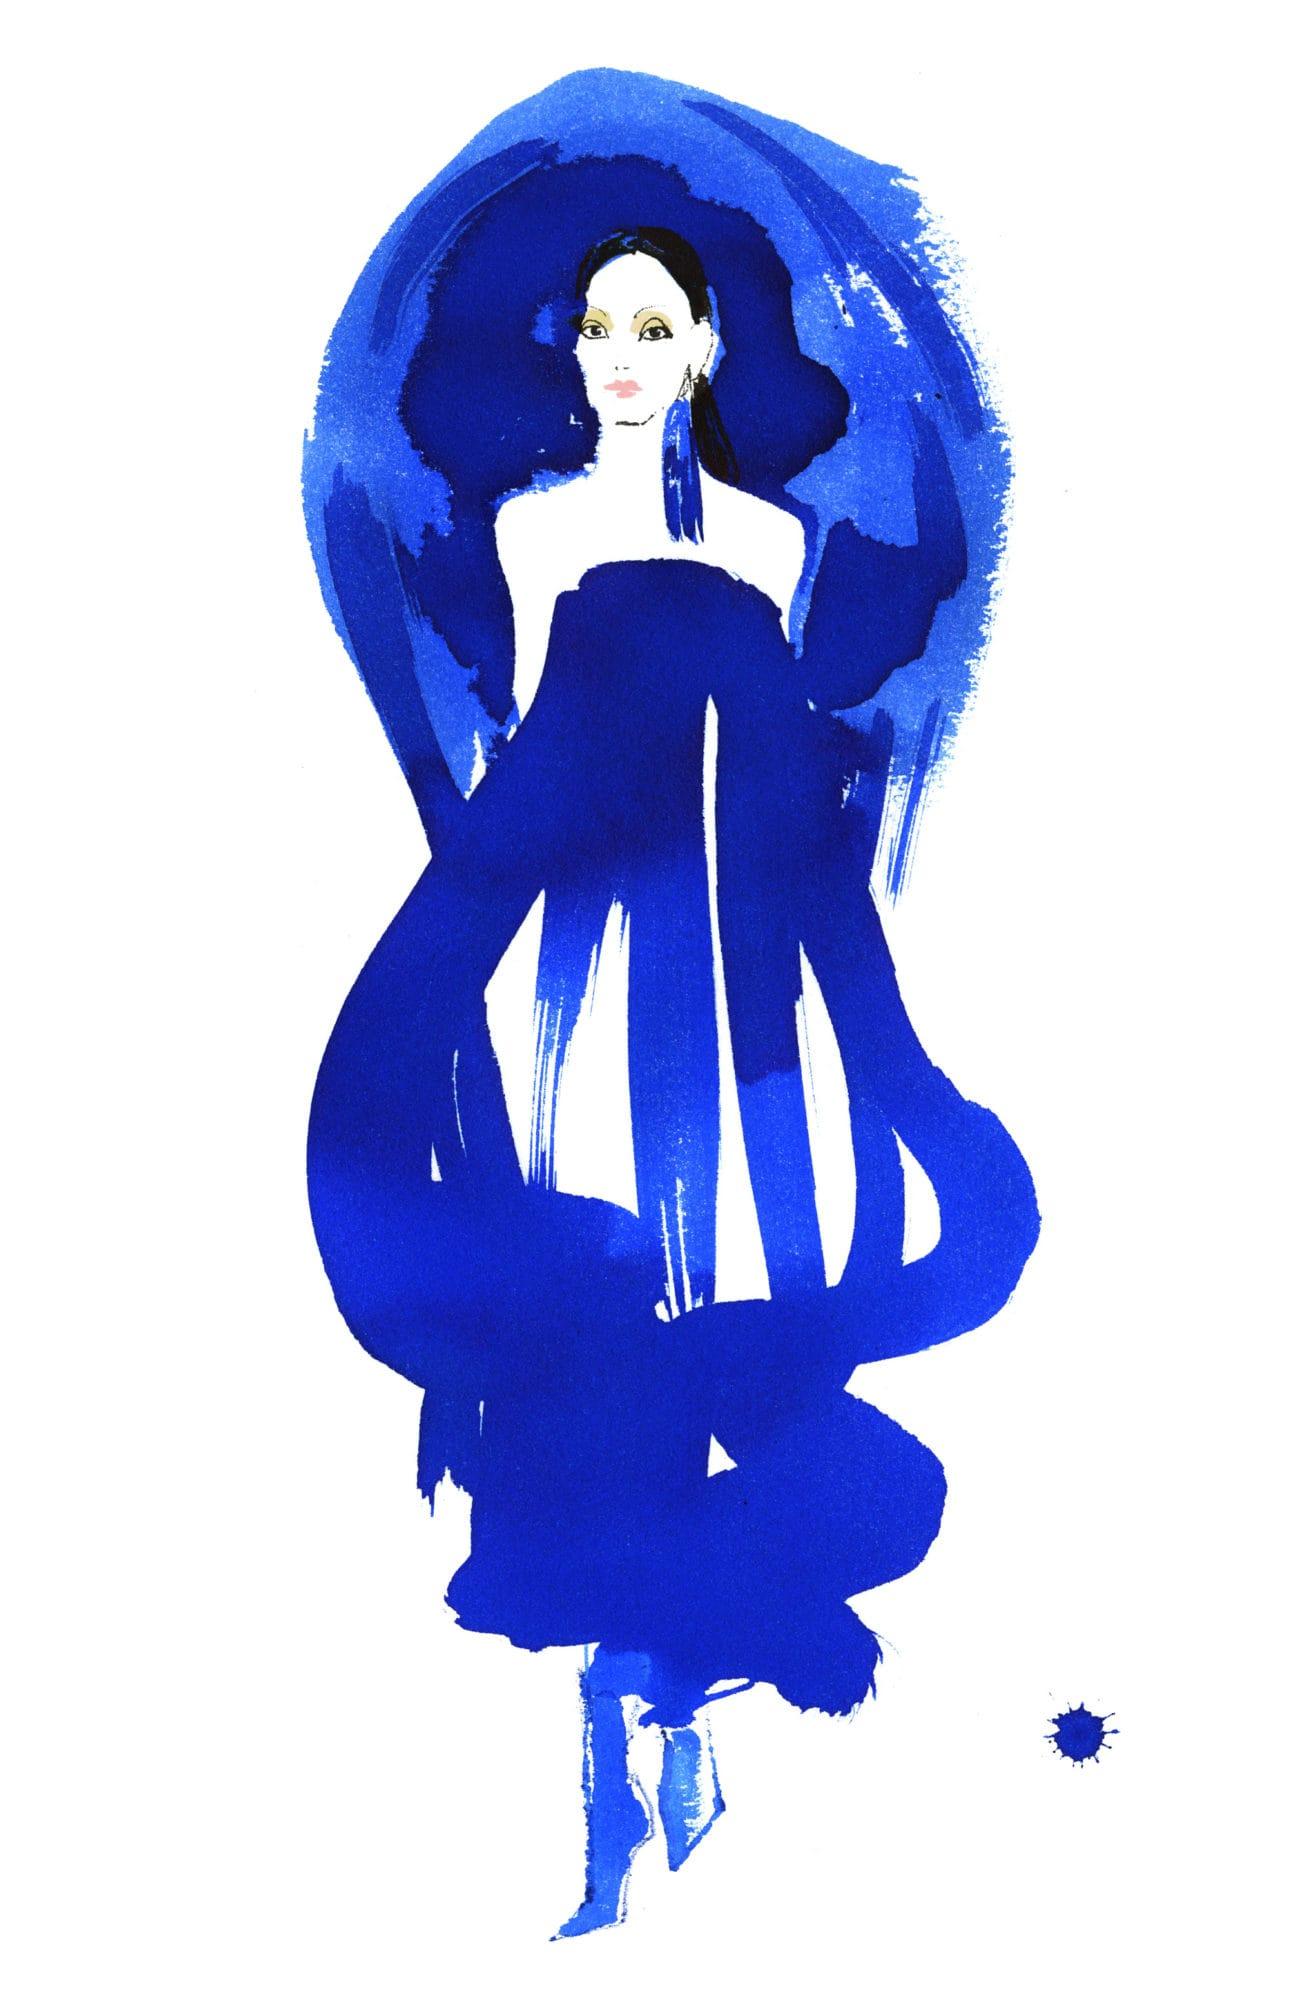 Lovisa-Burfitt-illustration-Givenchy-couture-2020